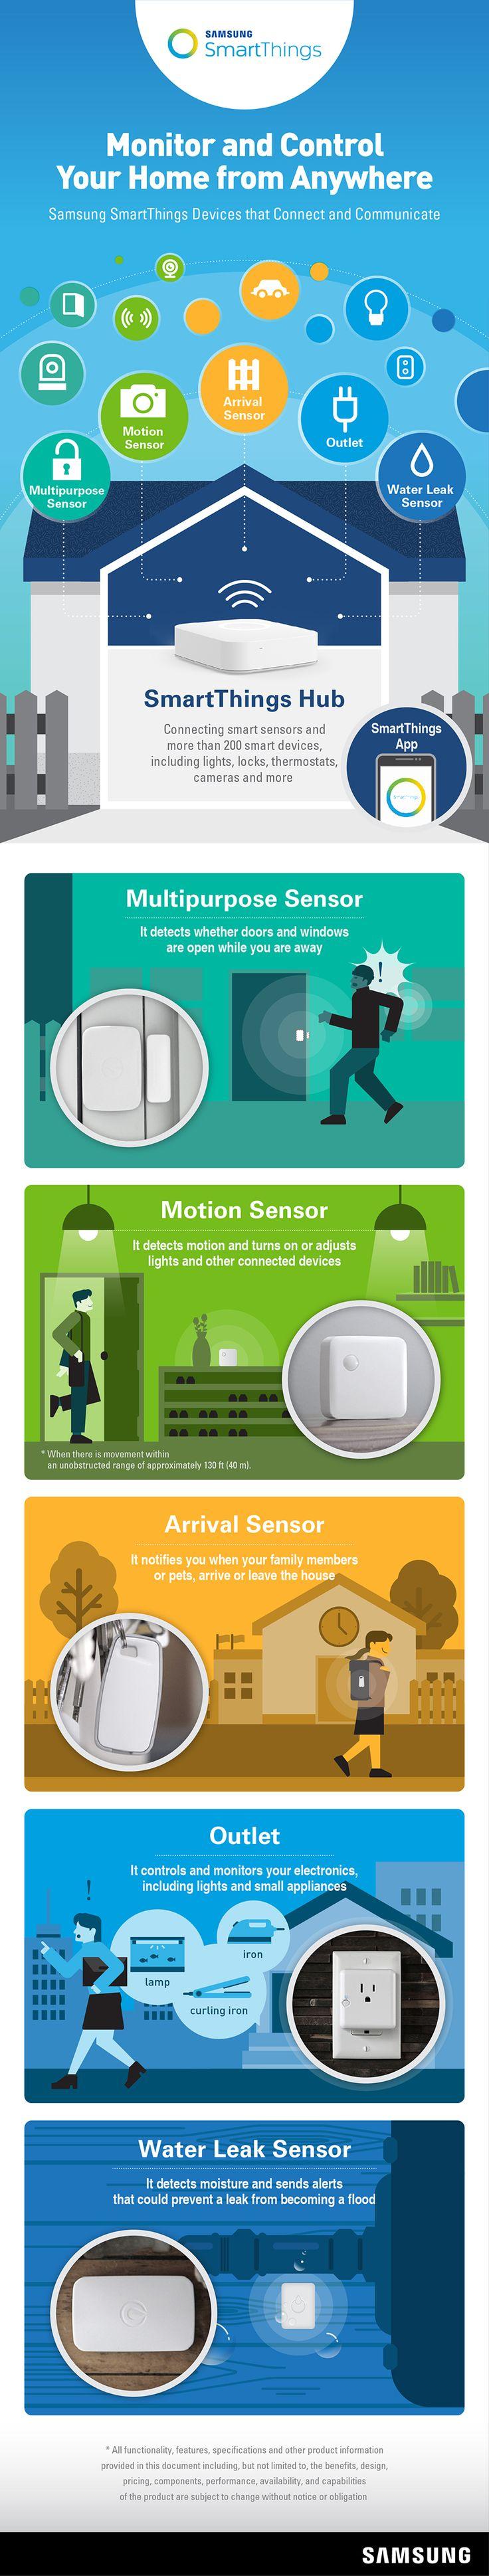 home automation design 1000 ideas. Samsung SmartThings Infographic Home Automation Design 1000 Ideas O